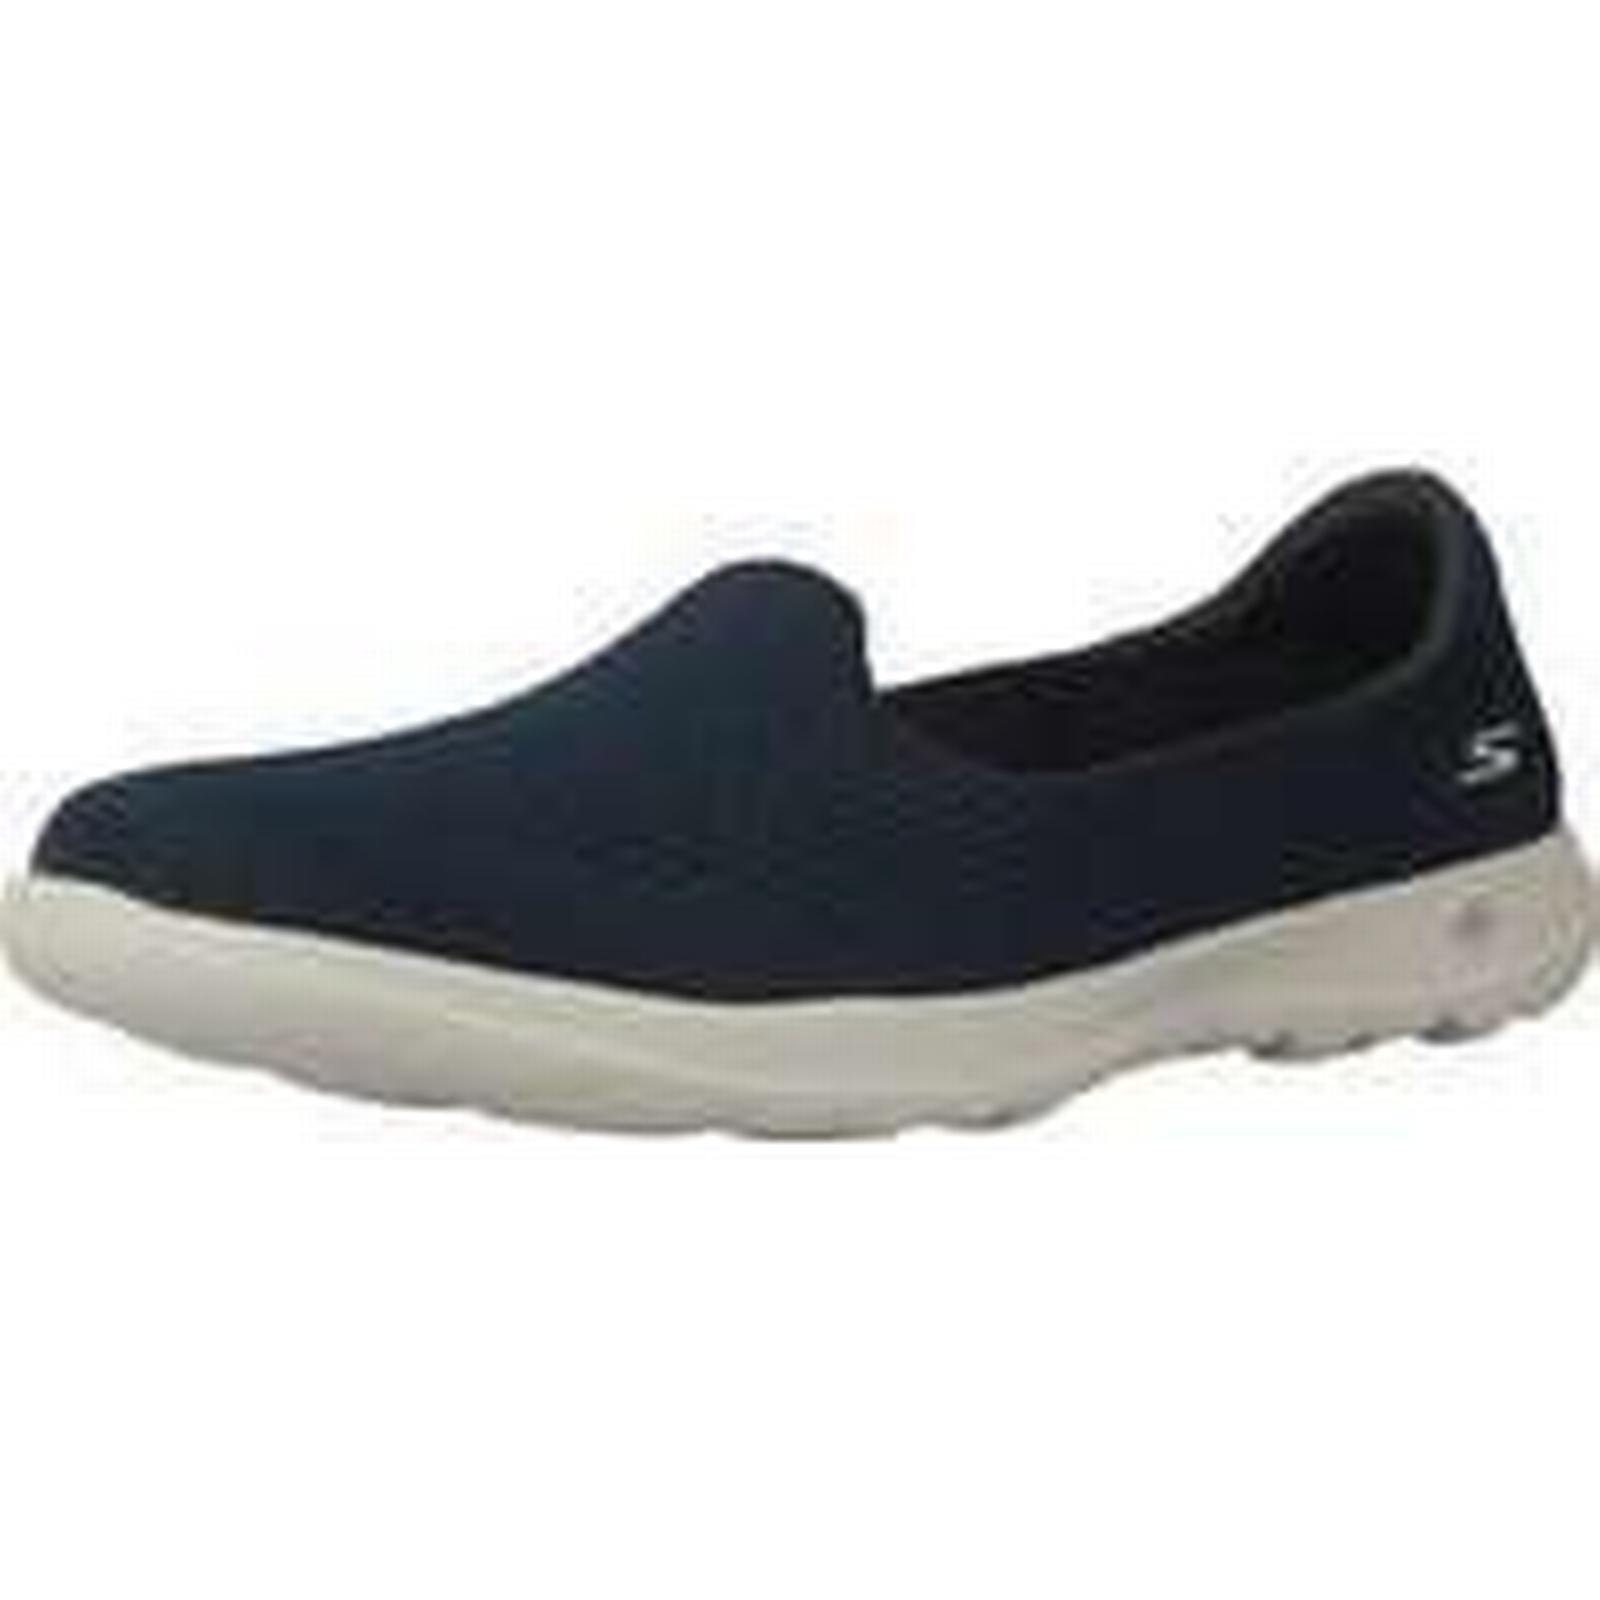 Spartoo.co.uk women's Skechers GO WALK LITE SHANTI women's Spartoo.co.uk Slip-ons (Shoes) in Blue 9a744d